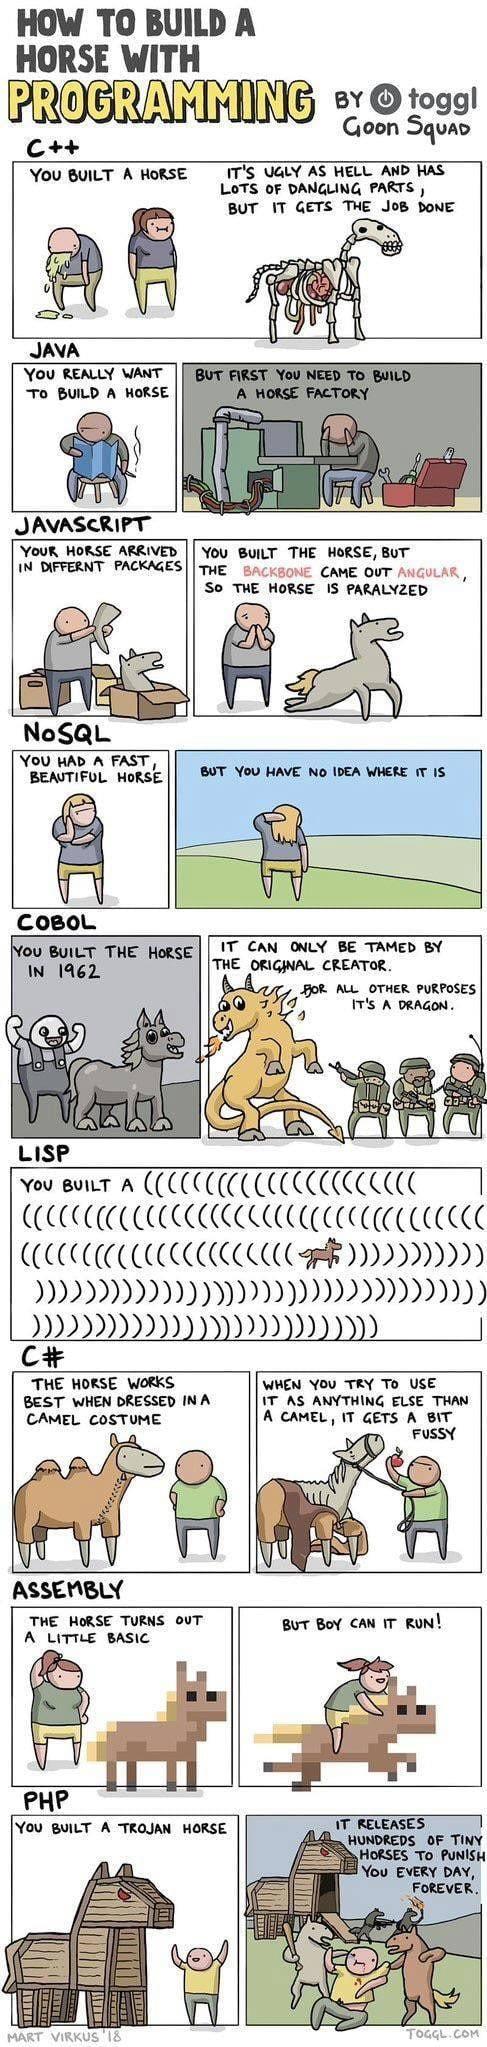 [Image: programming_horse.jpg]